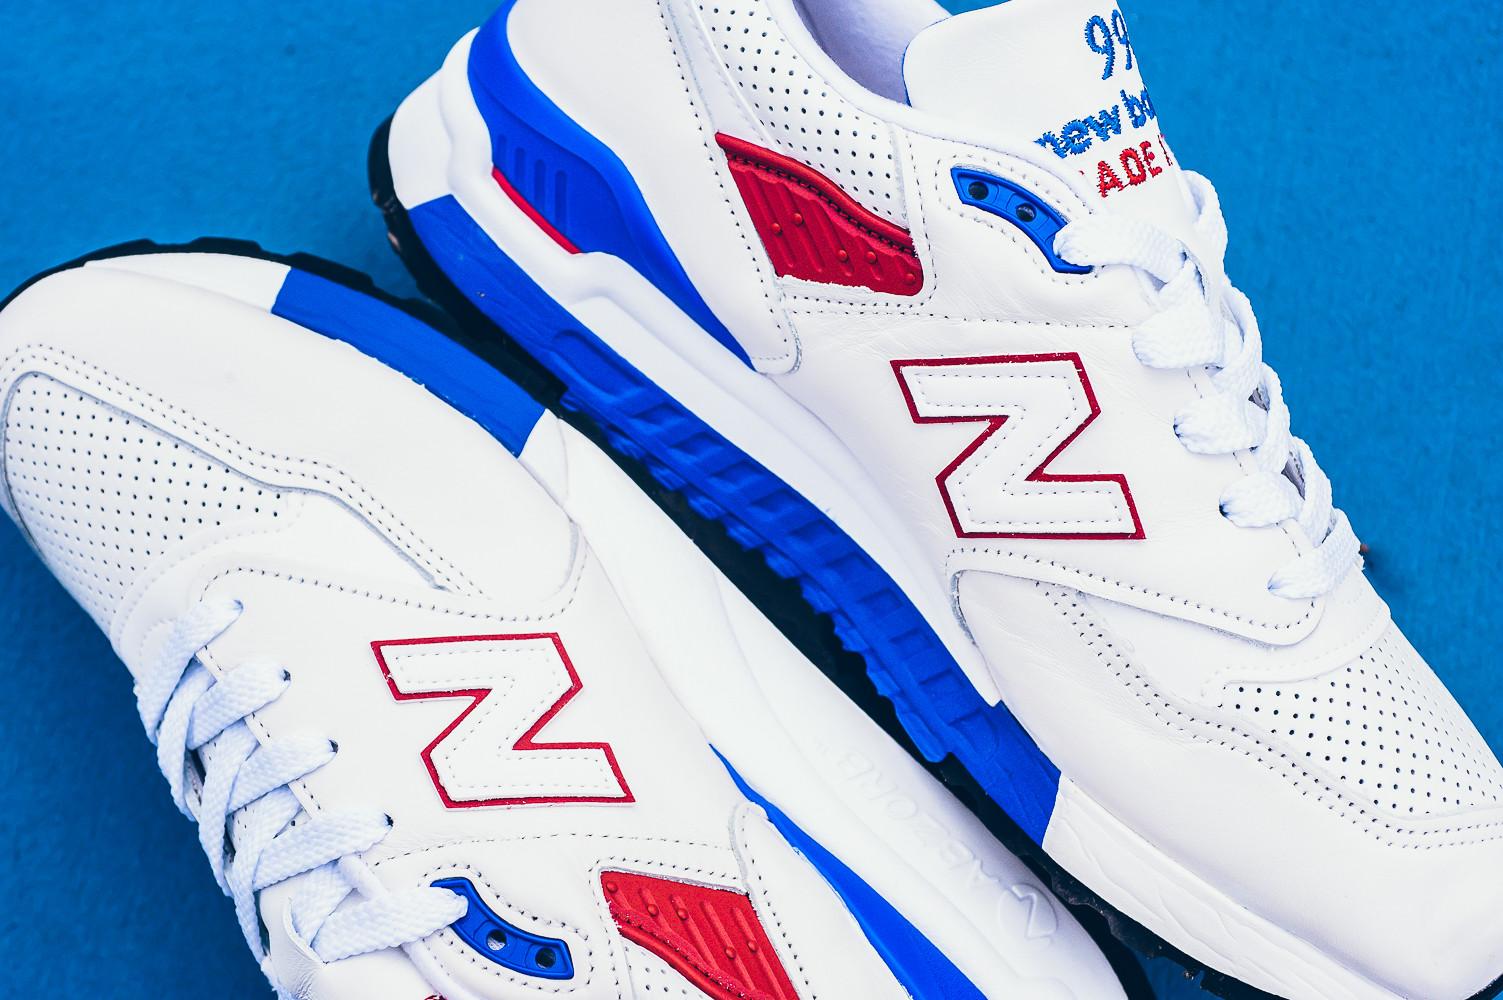 New_Balance_M997CYON_Sneaker_POlitics_Hypebeast_6